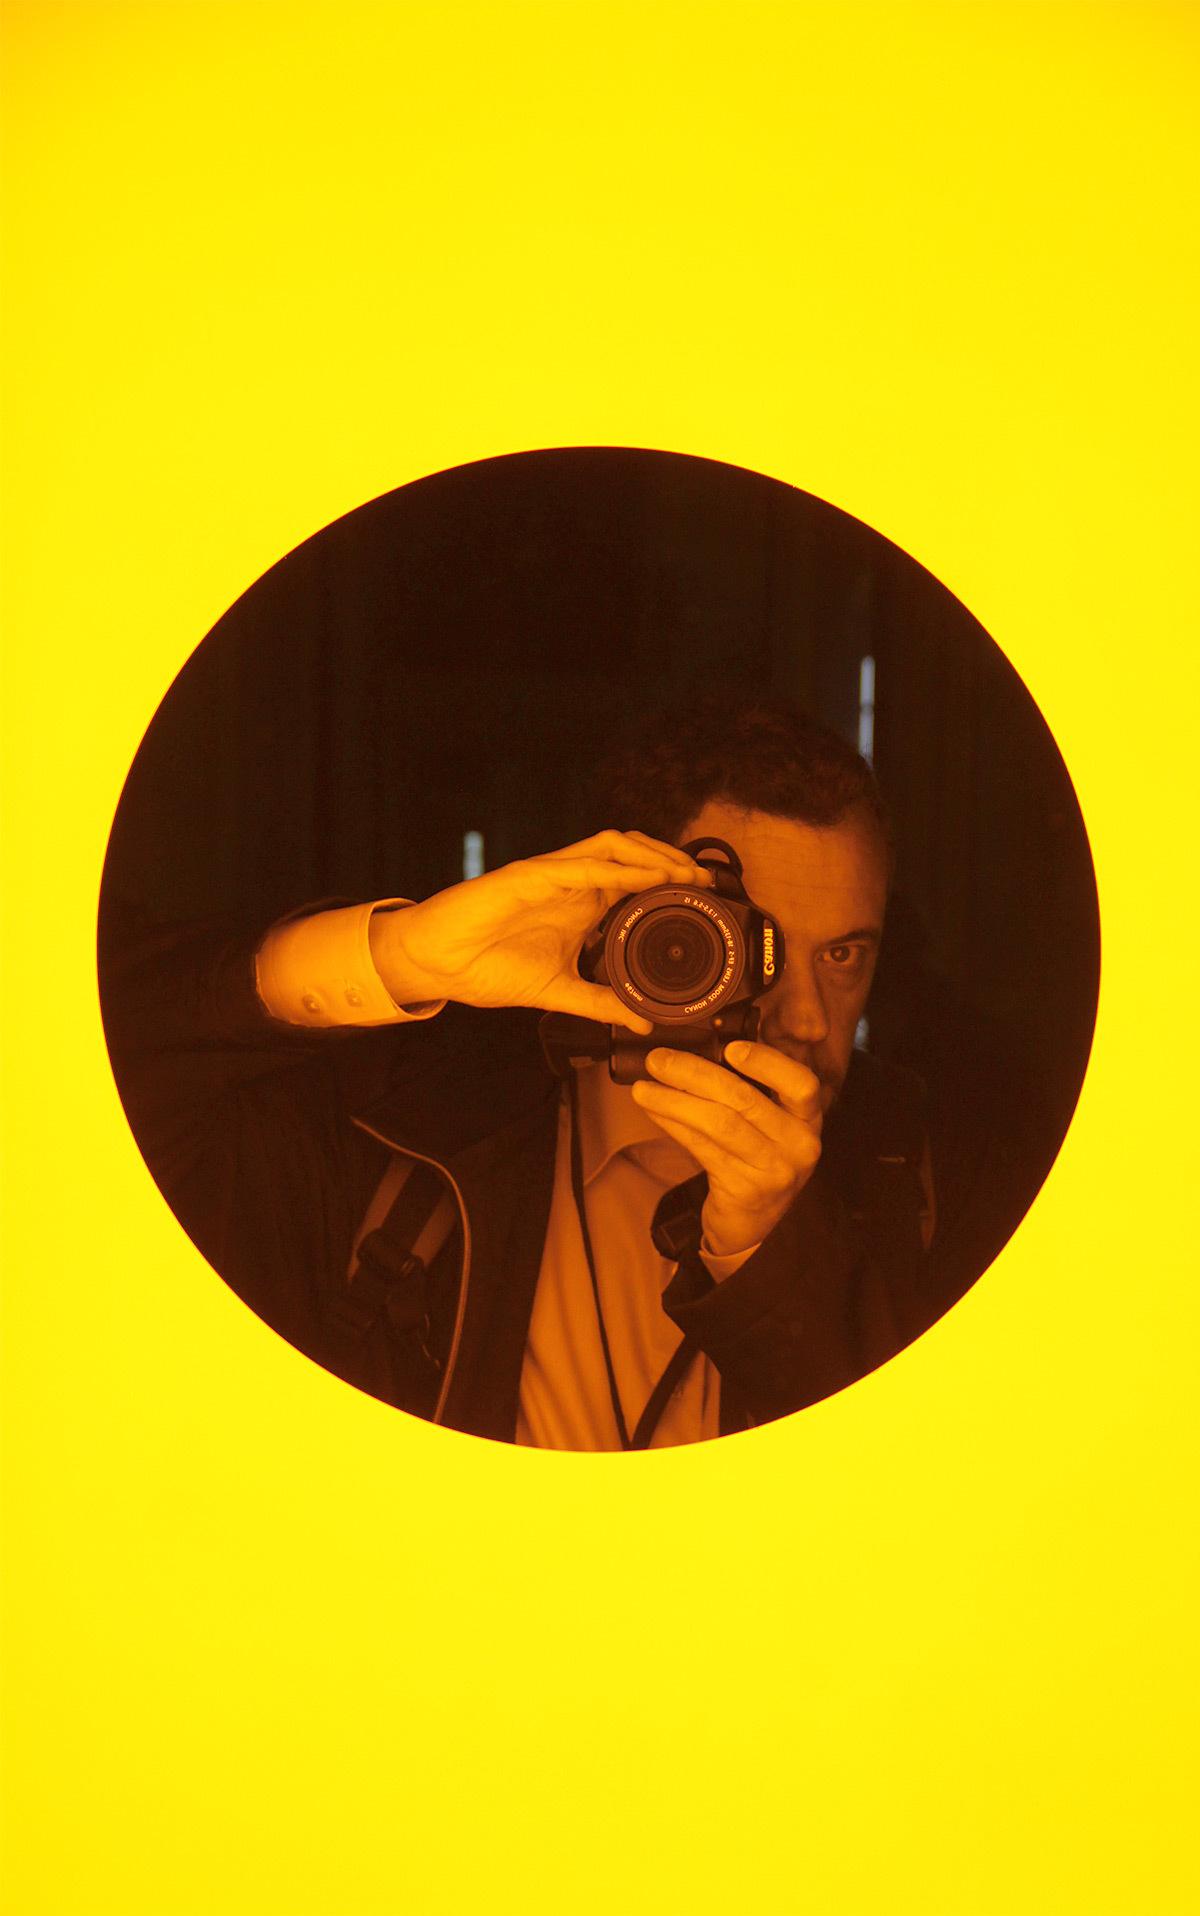 Olafur Eliasson, Deep mirror yellow, 2016 - Château de Versailles, France - Photo : Vincent Laganier